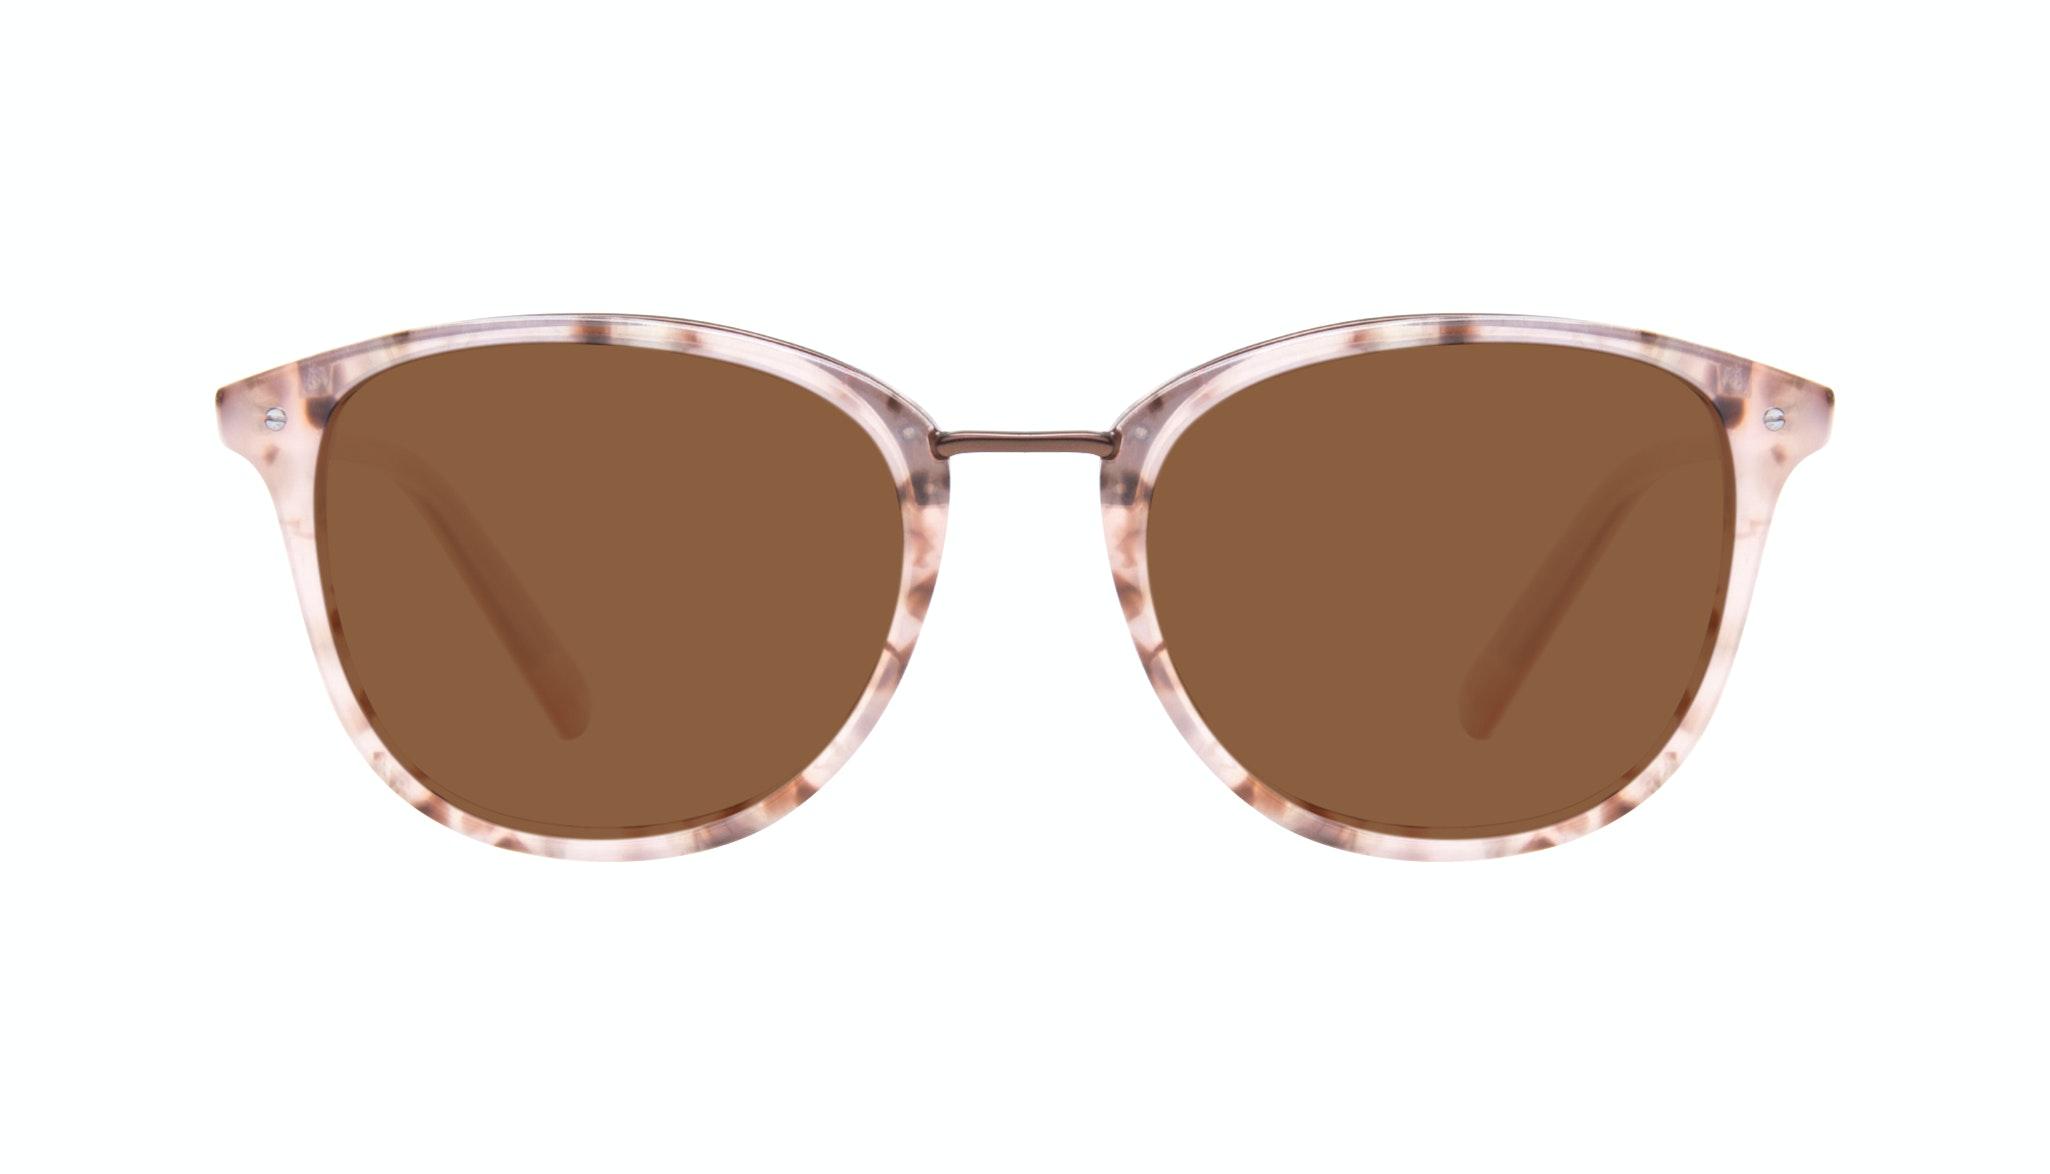 Affordable Fashion Glasses Square Round Sunglasses Women Bella Blush Tortie